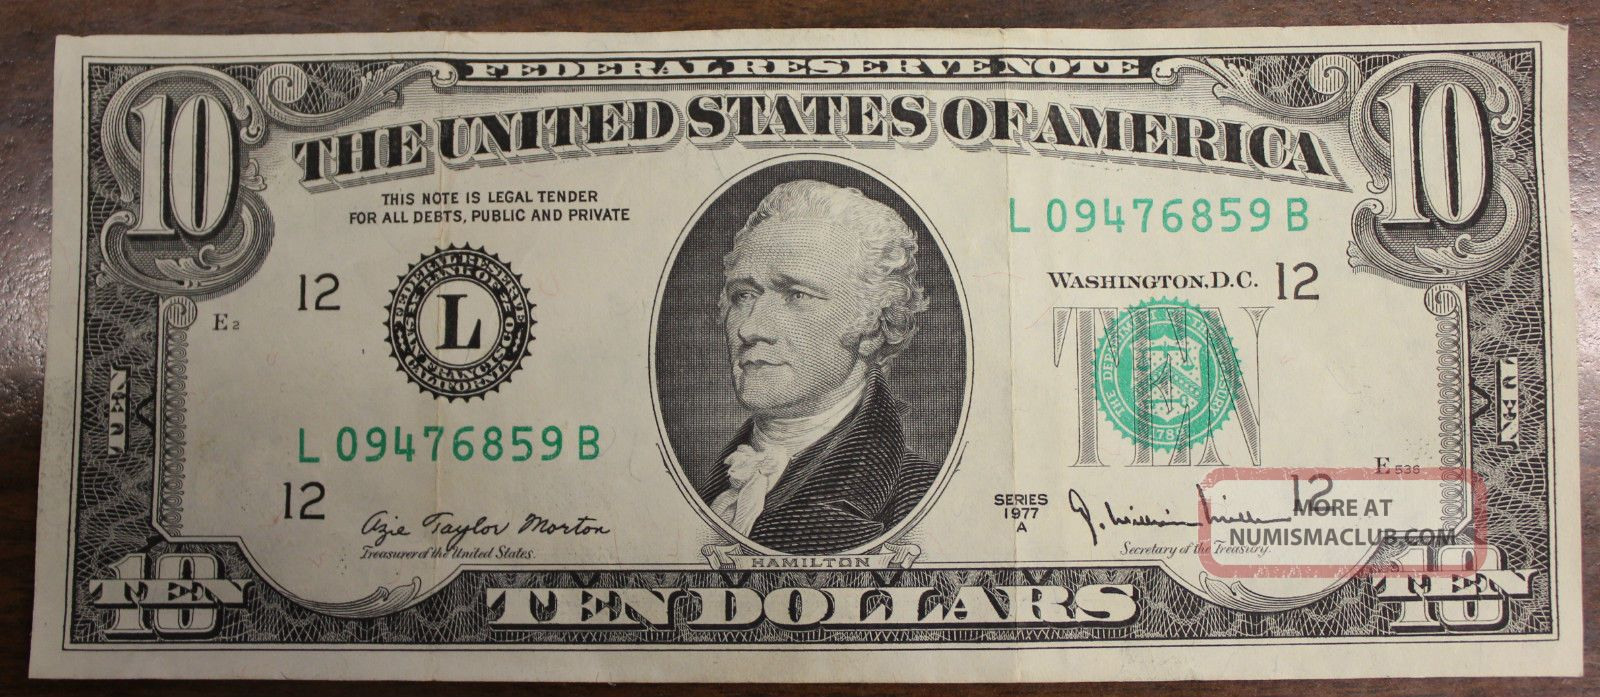 rare 1977 a 10 dollar bill overprint error federal